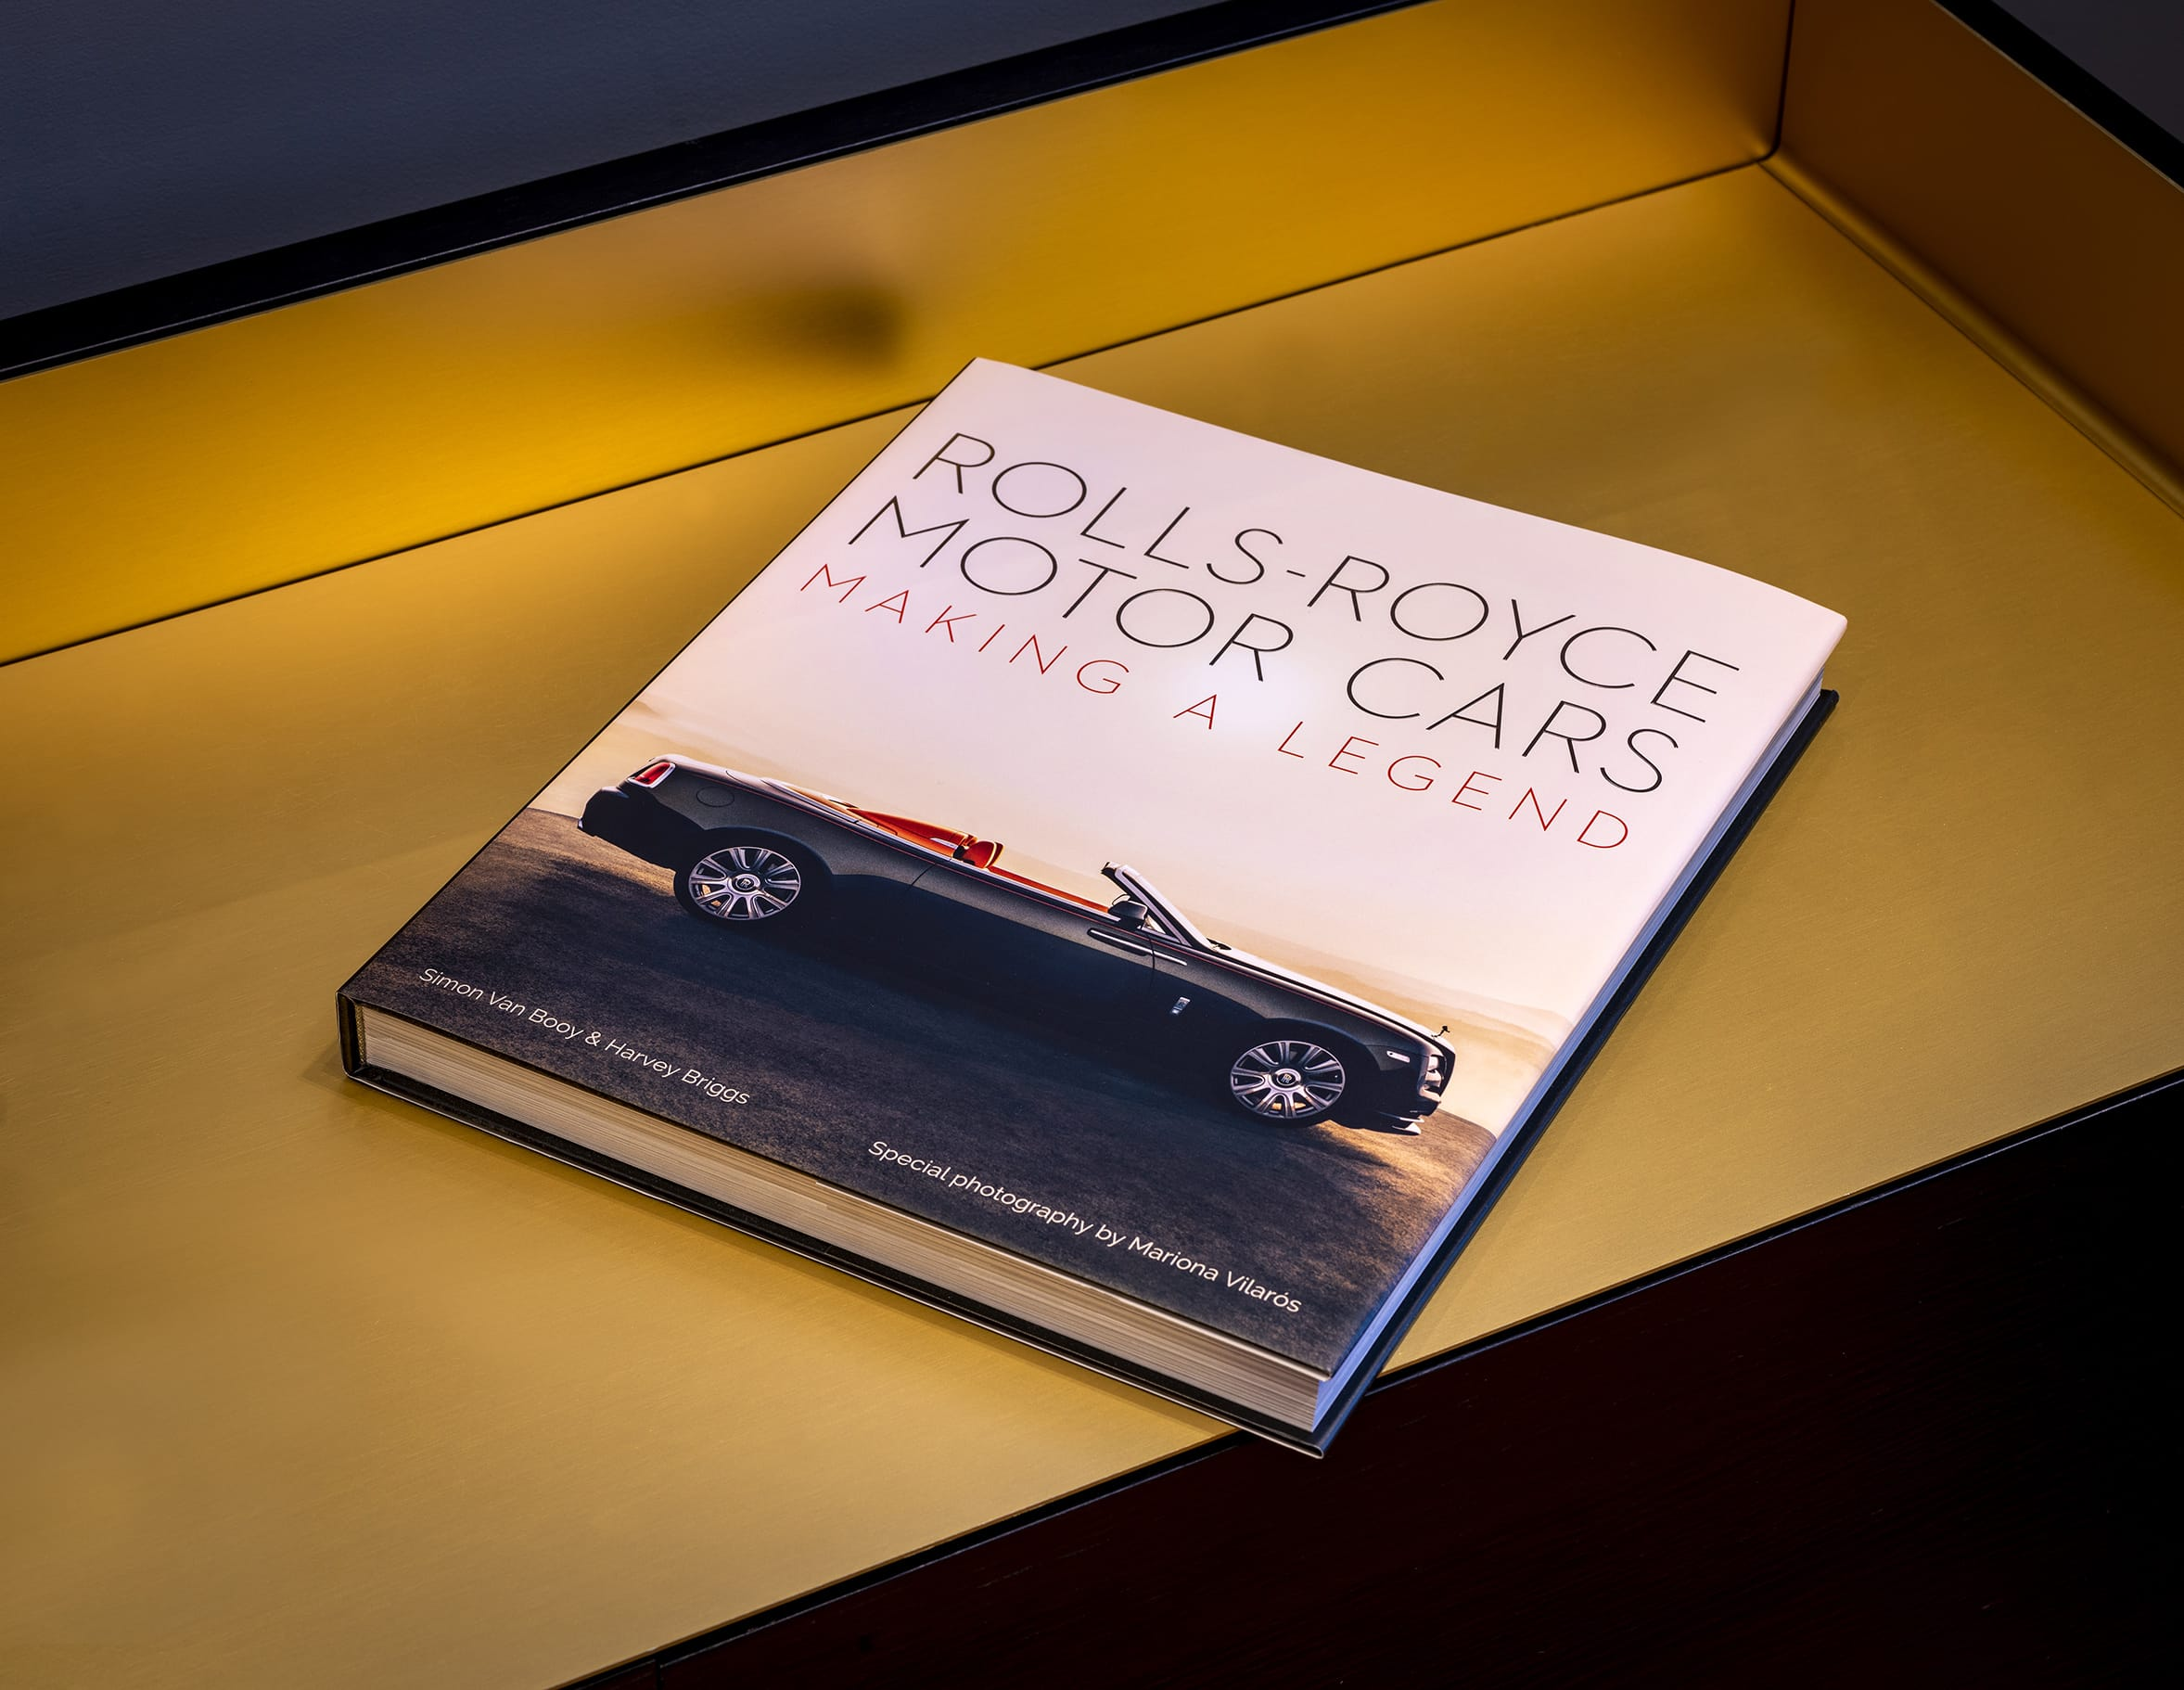 P90419178 highRes rolls royce motor ca